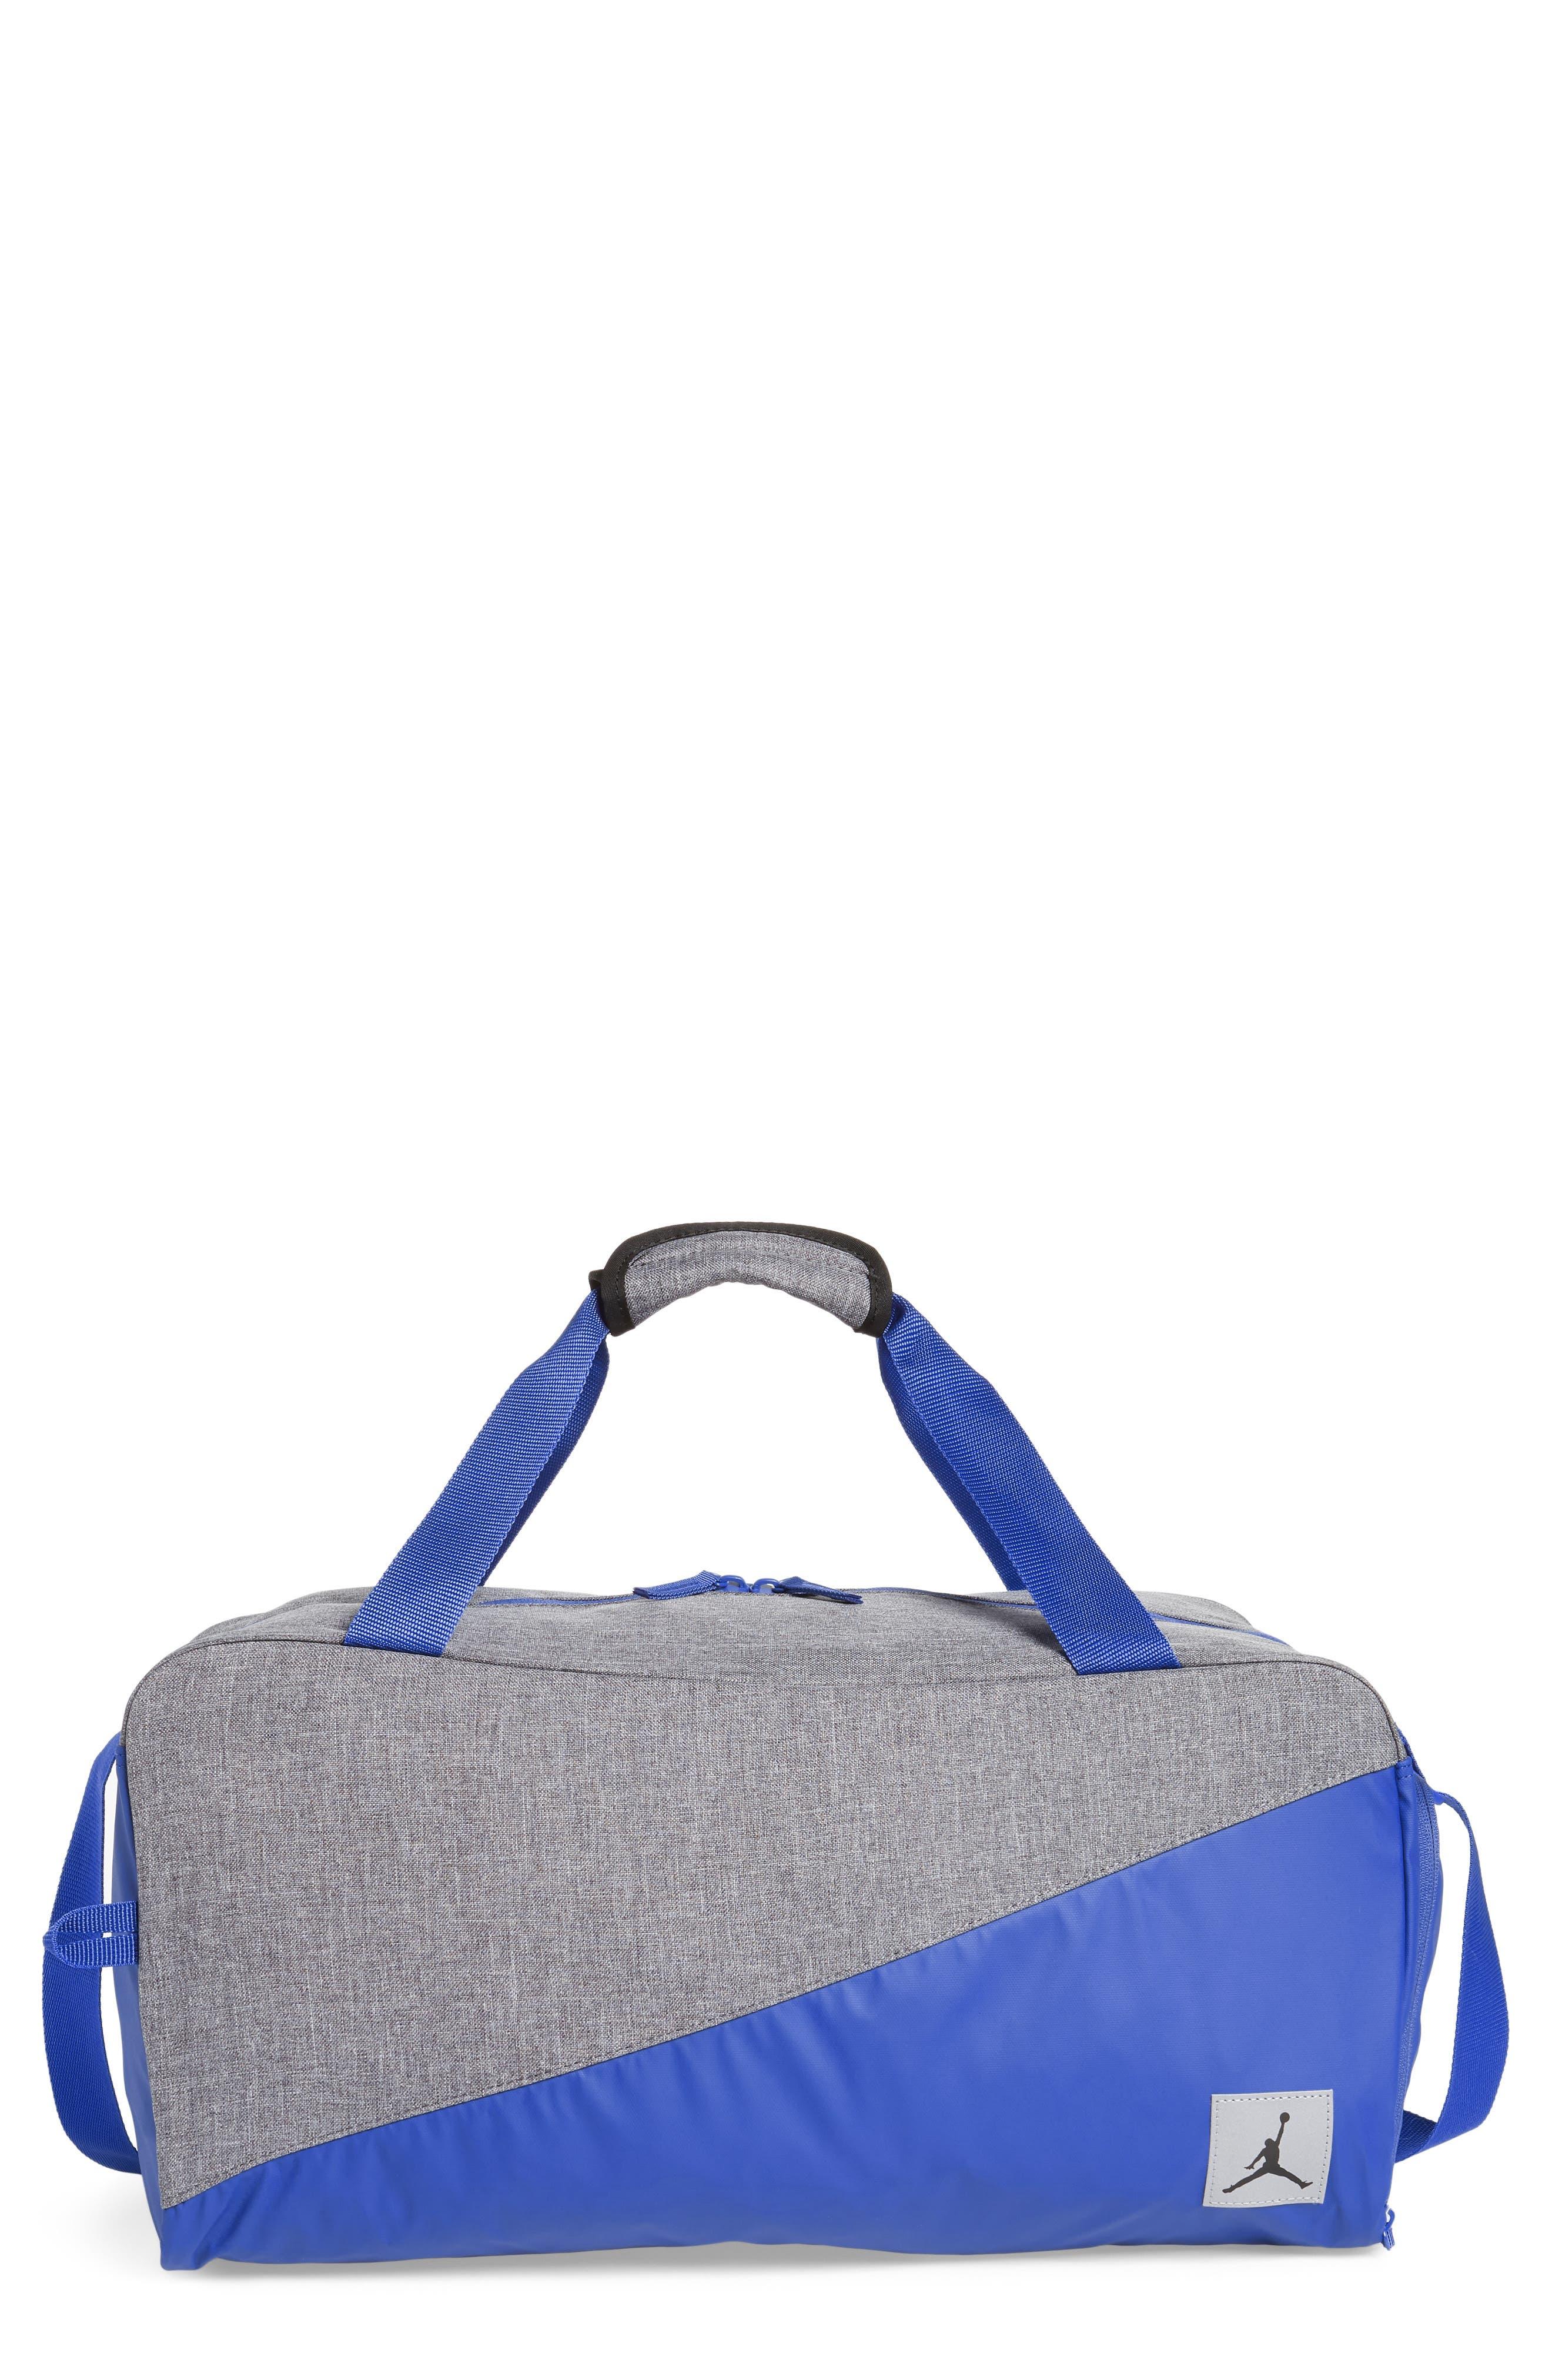 Boys Jordan Pivot Duffle Bag  Blue